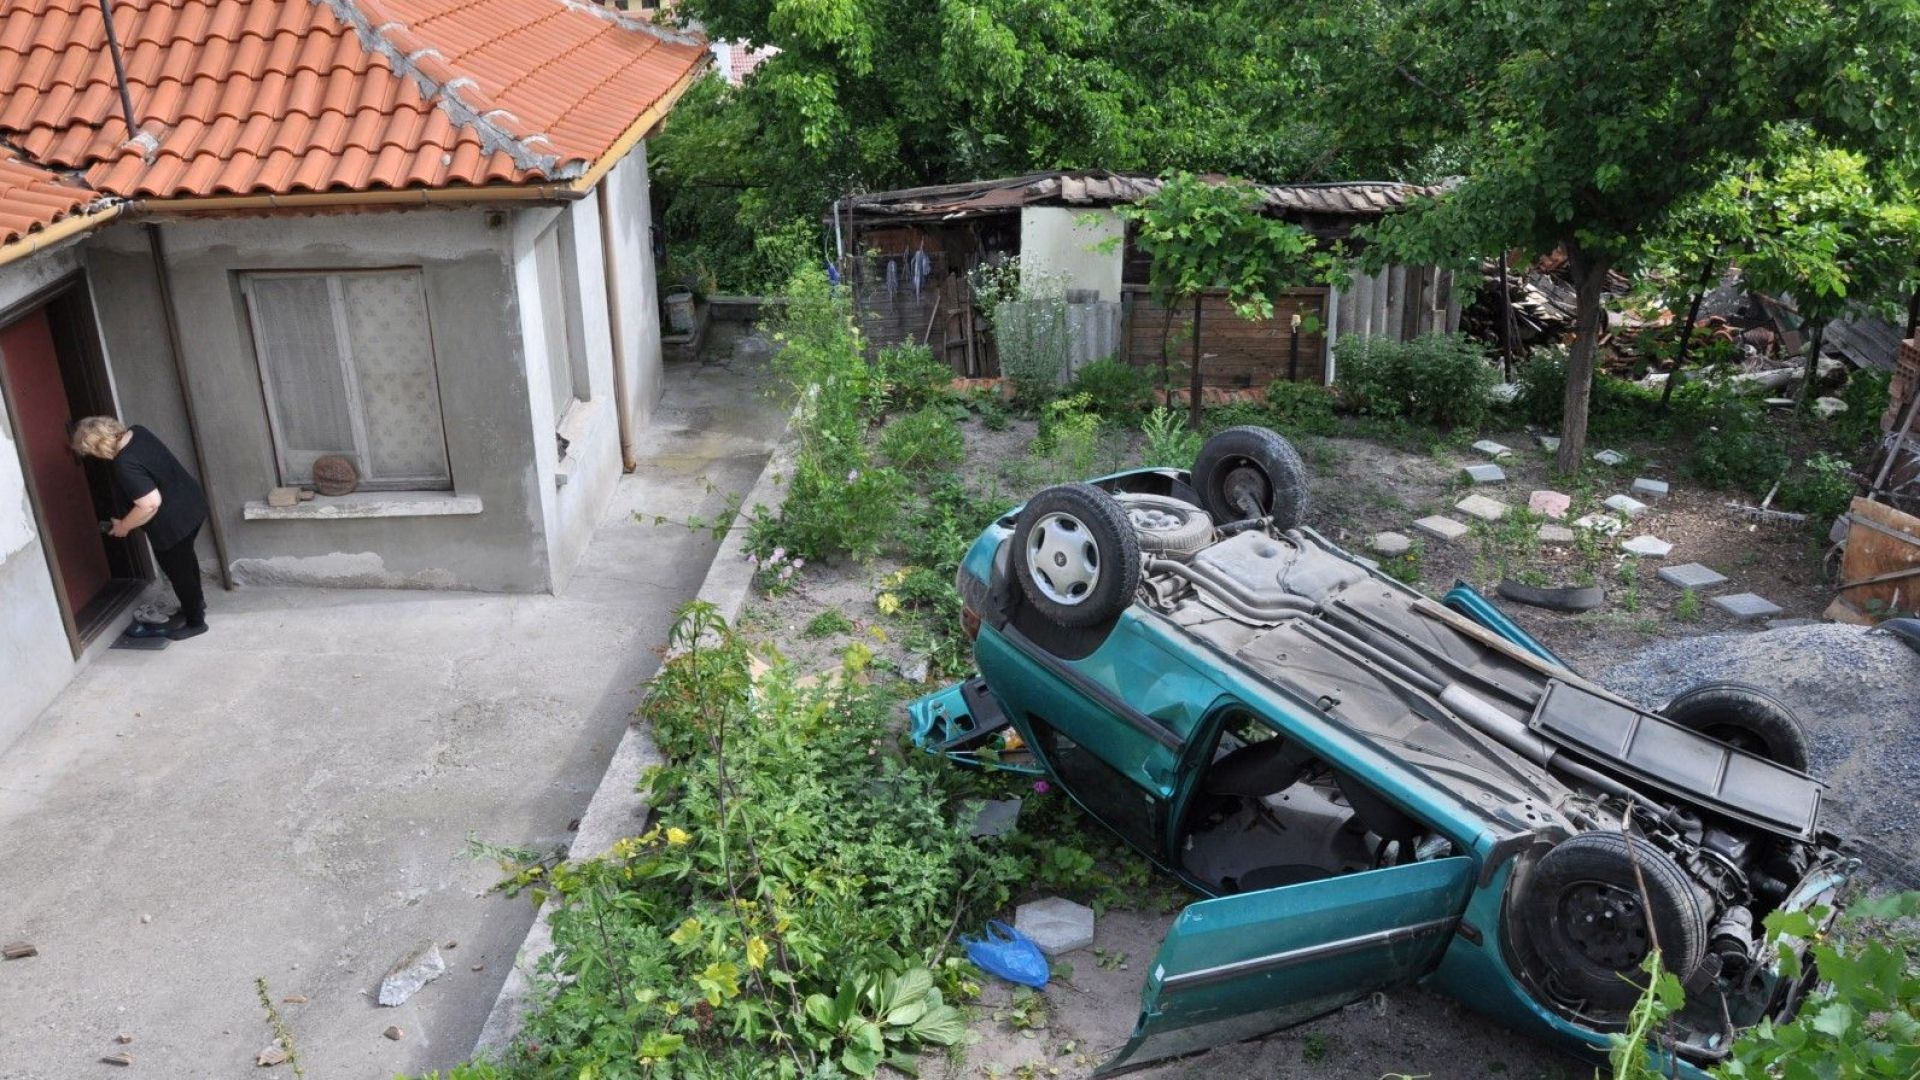 Шофьорката Петя Иванова загубила управлението над автомобила заради несъобразена скорост